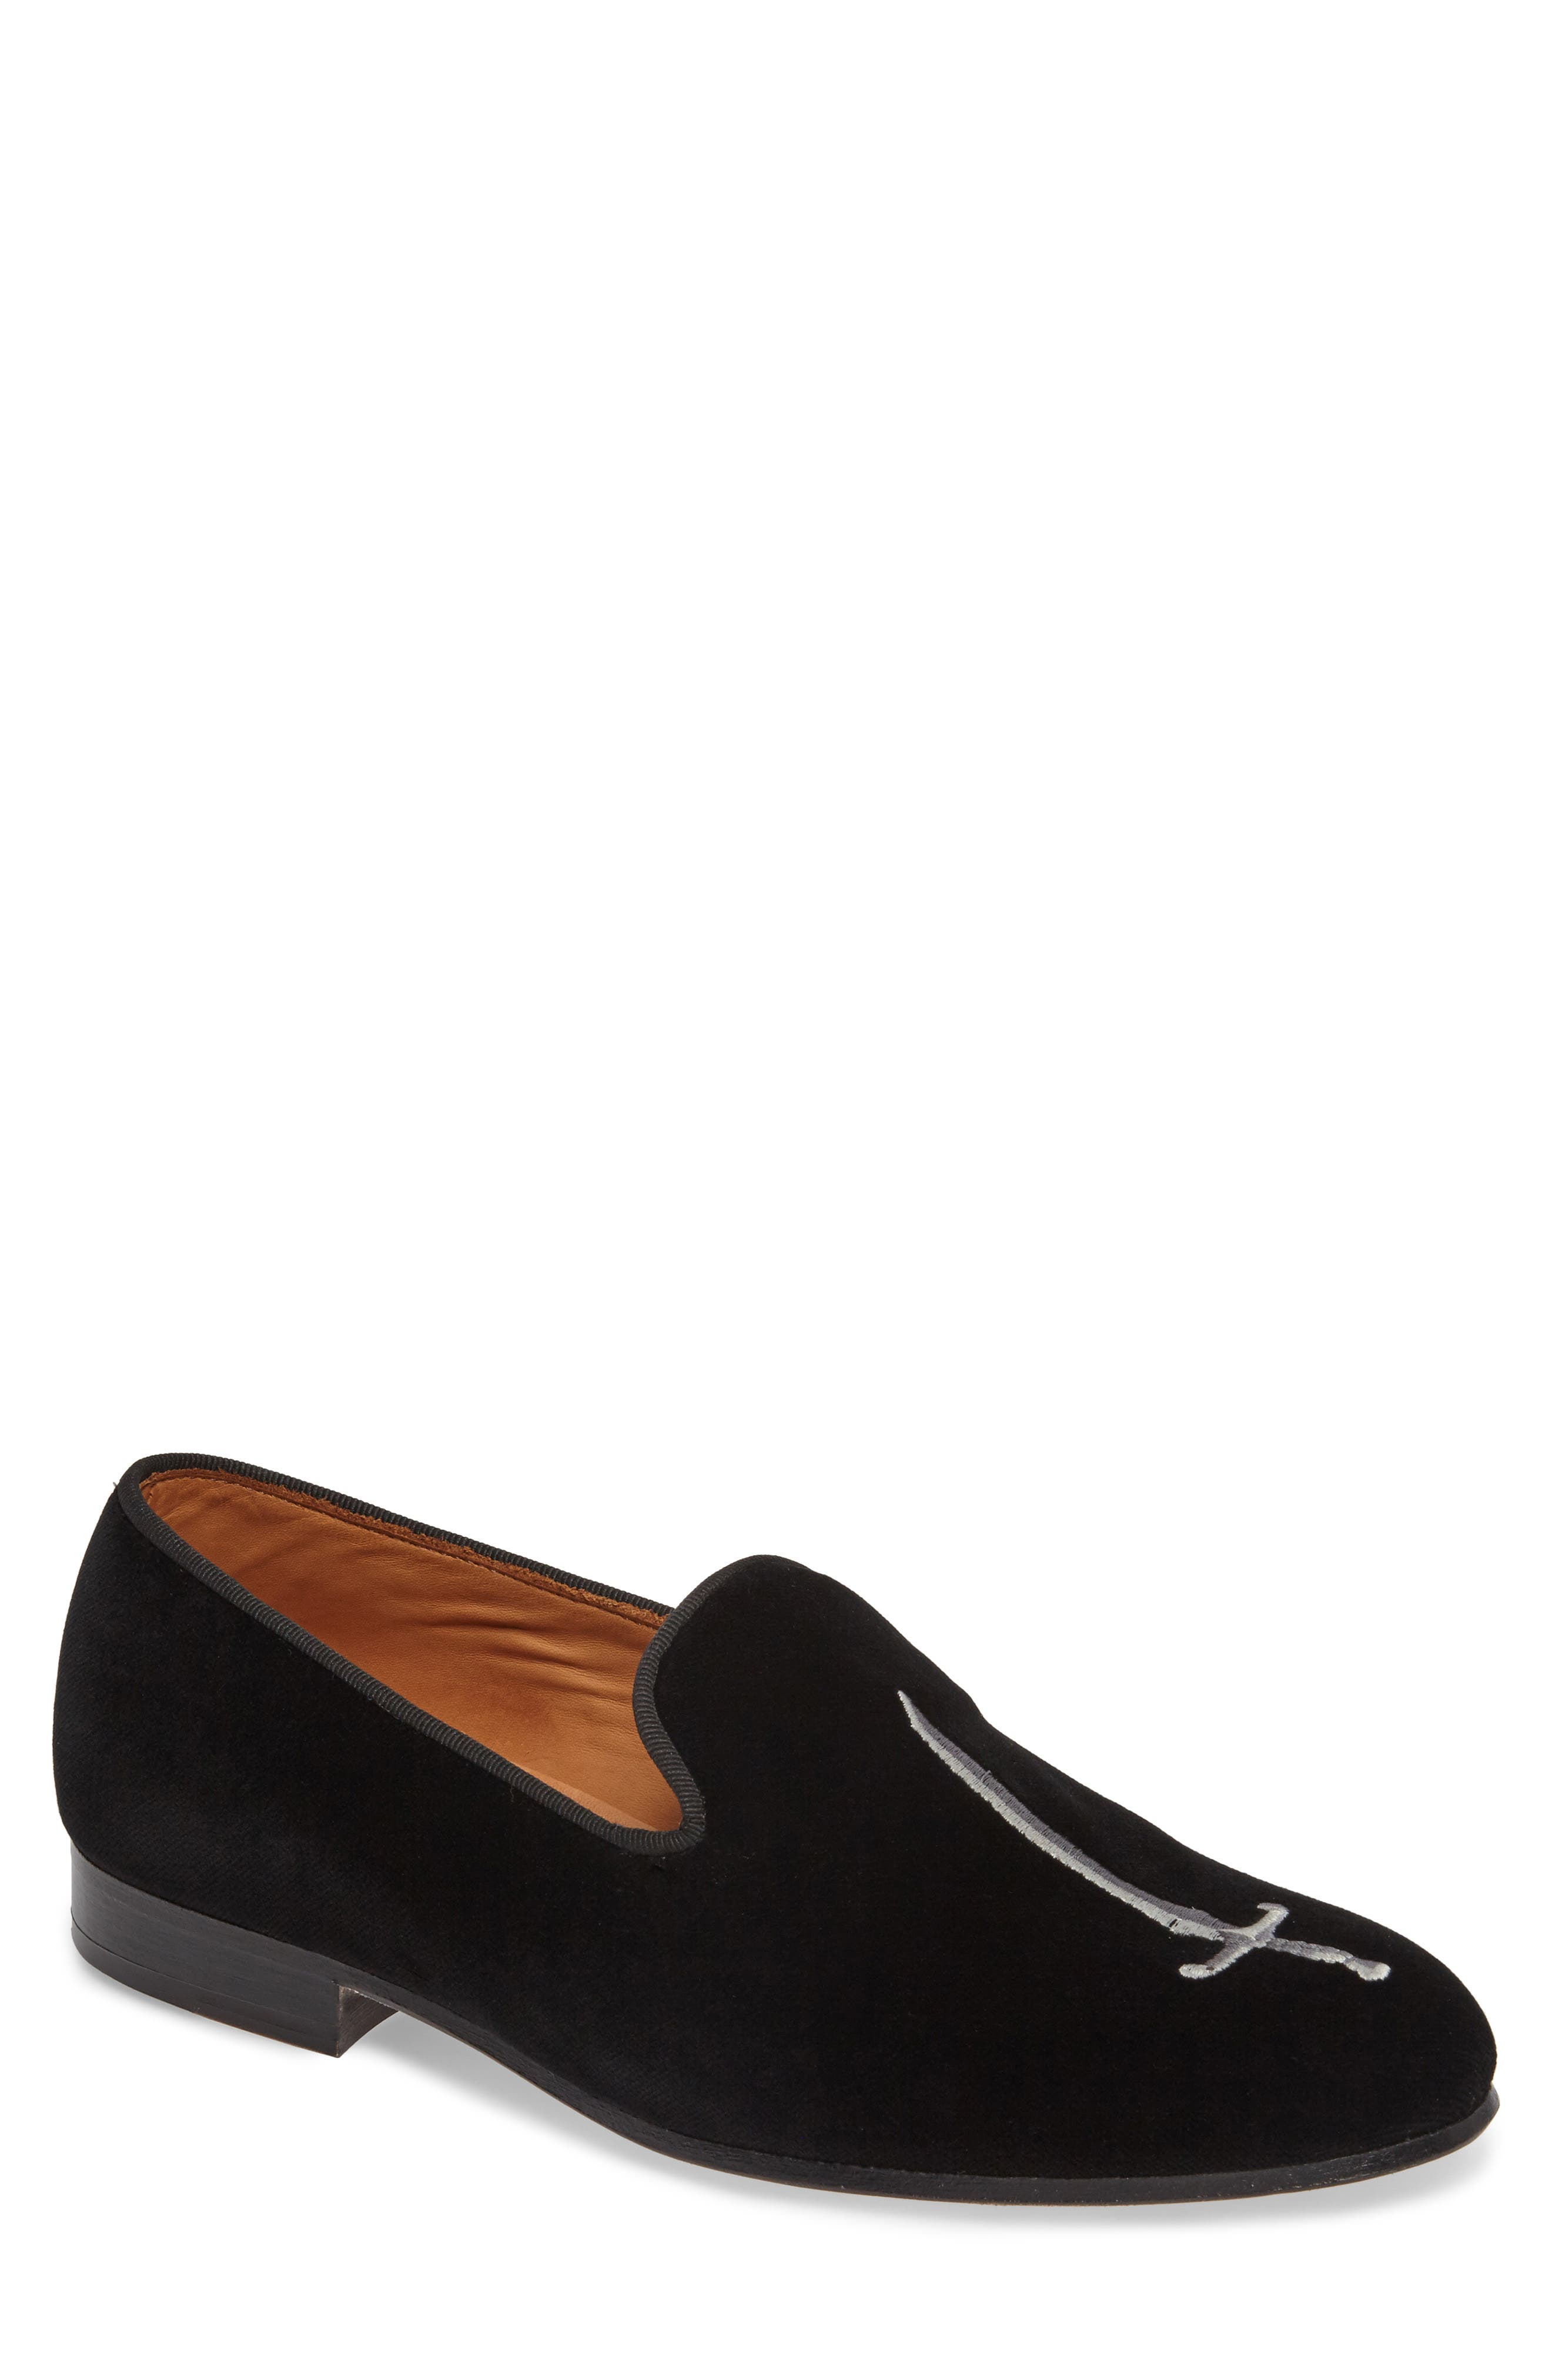 Bravi 2 Loafer,                             Main thumbnail 1, color,                             Black Leather